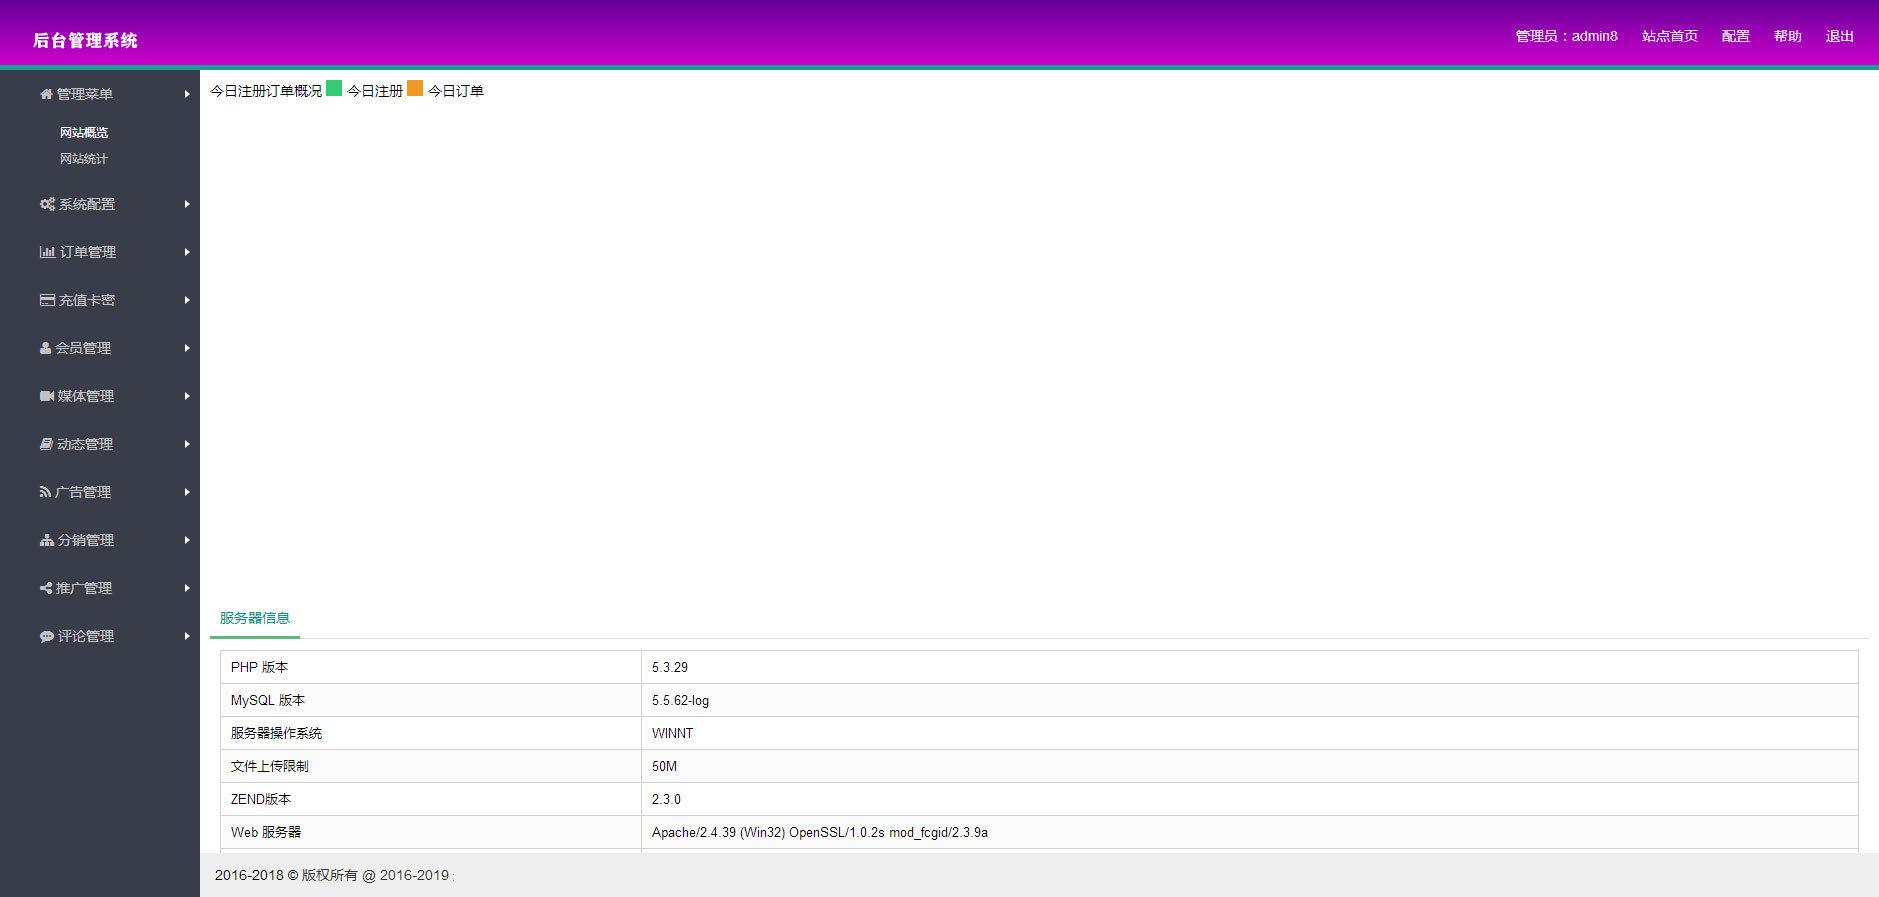 PHP猫扑盒子引流神器在线播放神马视频电影网站源码